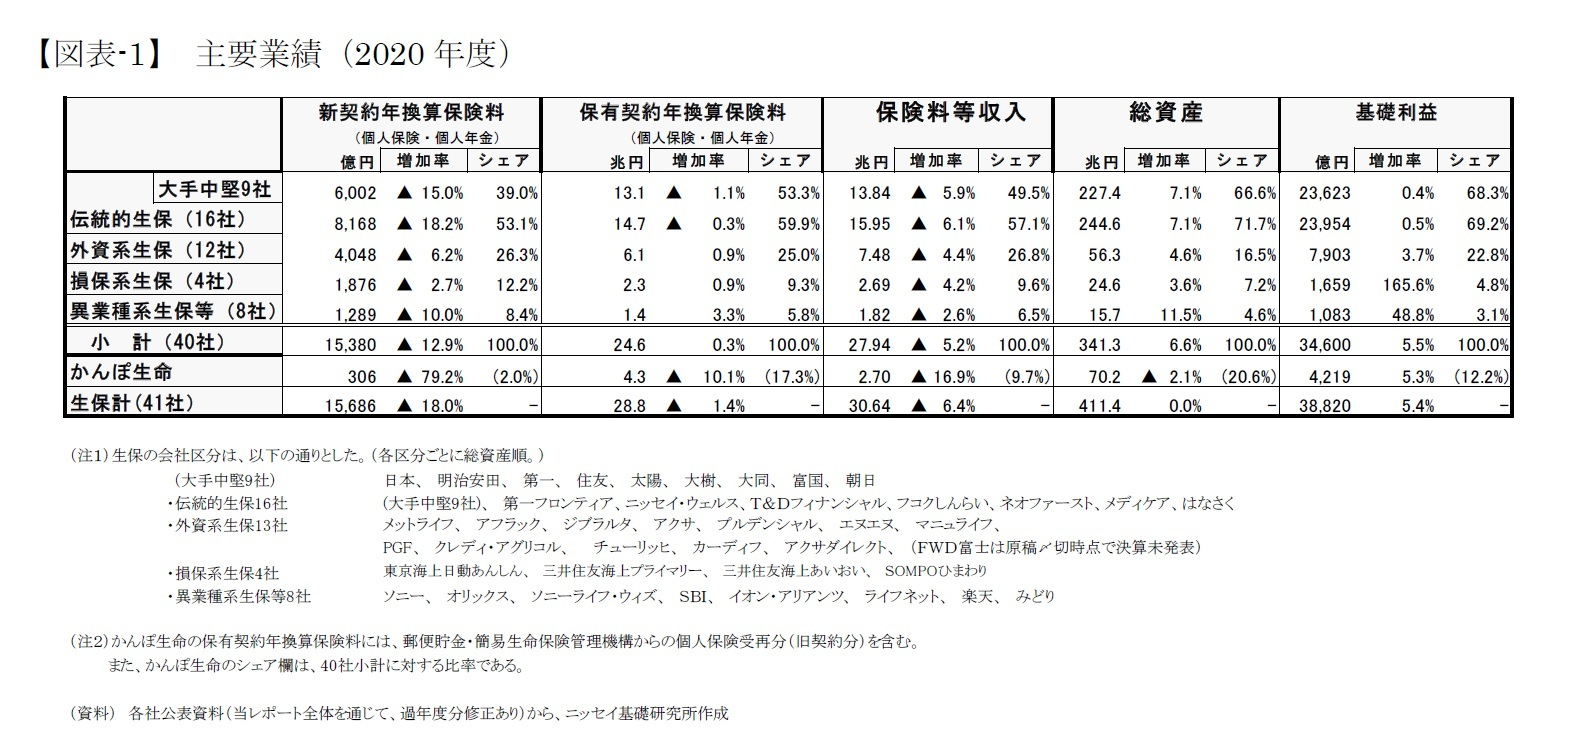 【図表-1】 主要業績(2020年度)